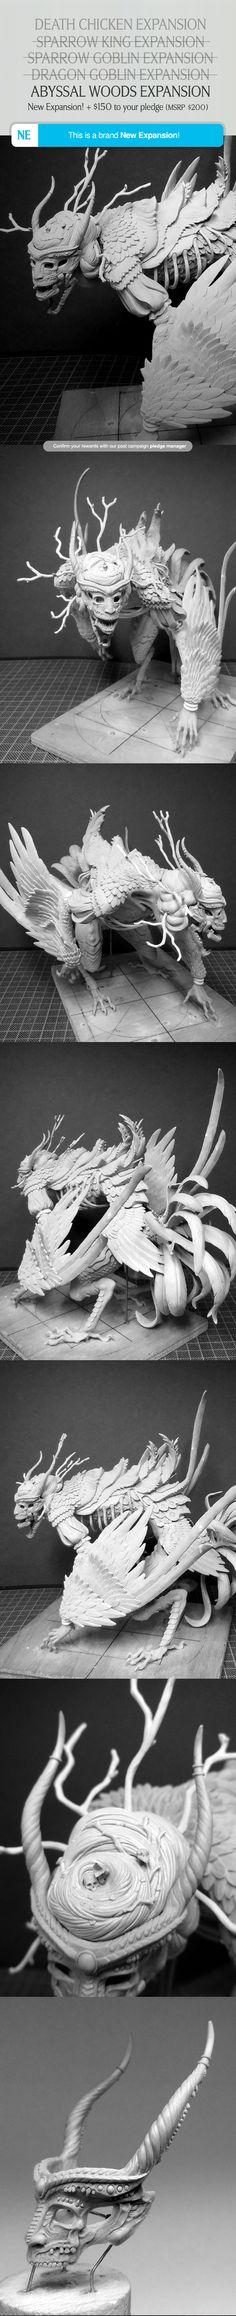 Kingdom Death: Monster 1.5 by Kingdom Death — Kickstarter